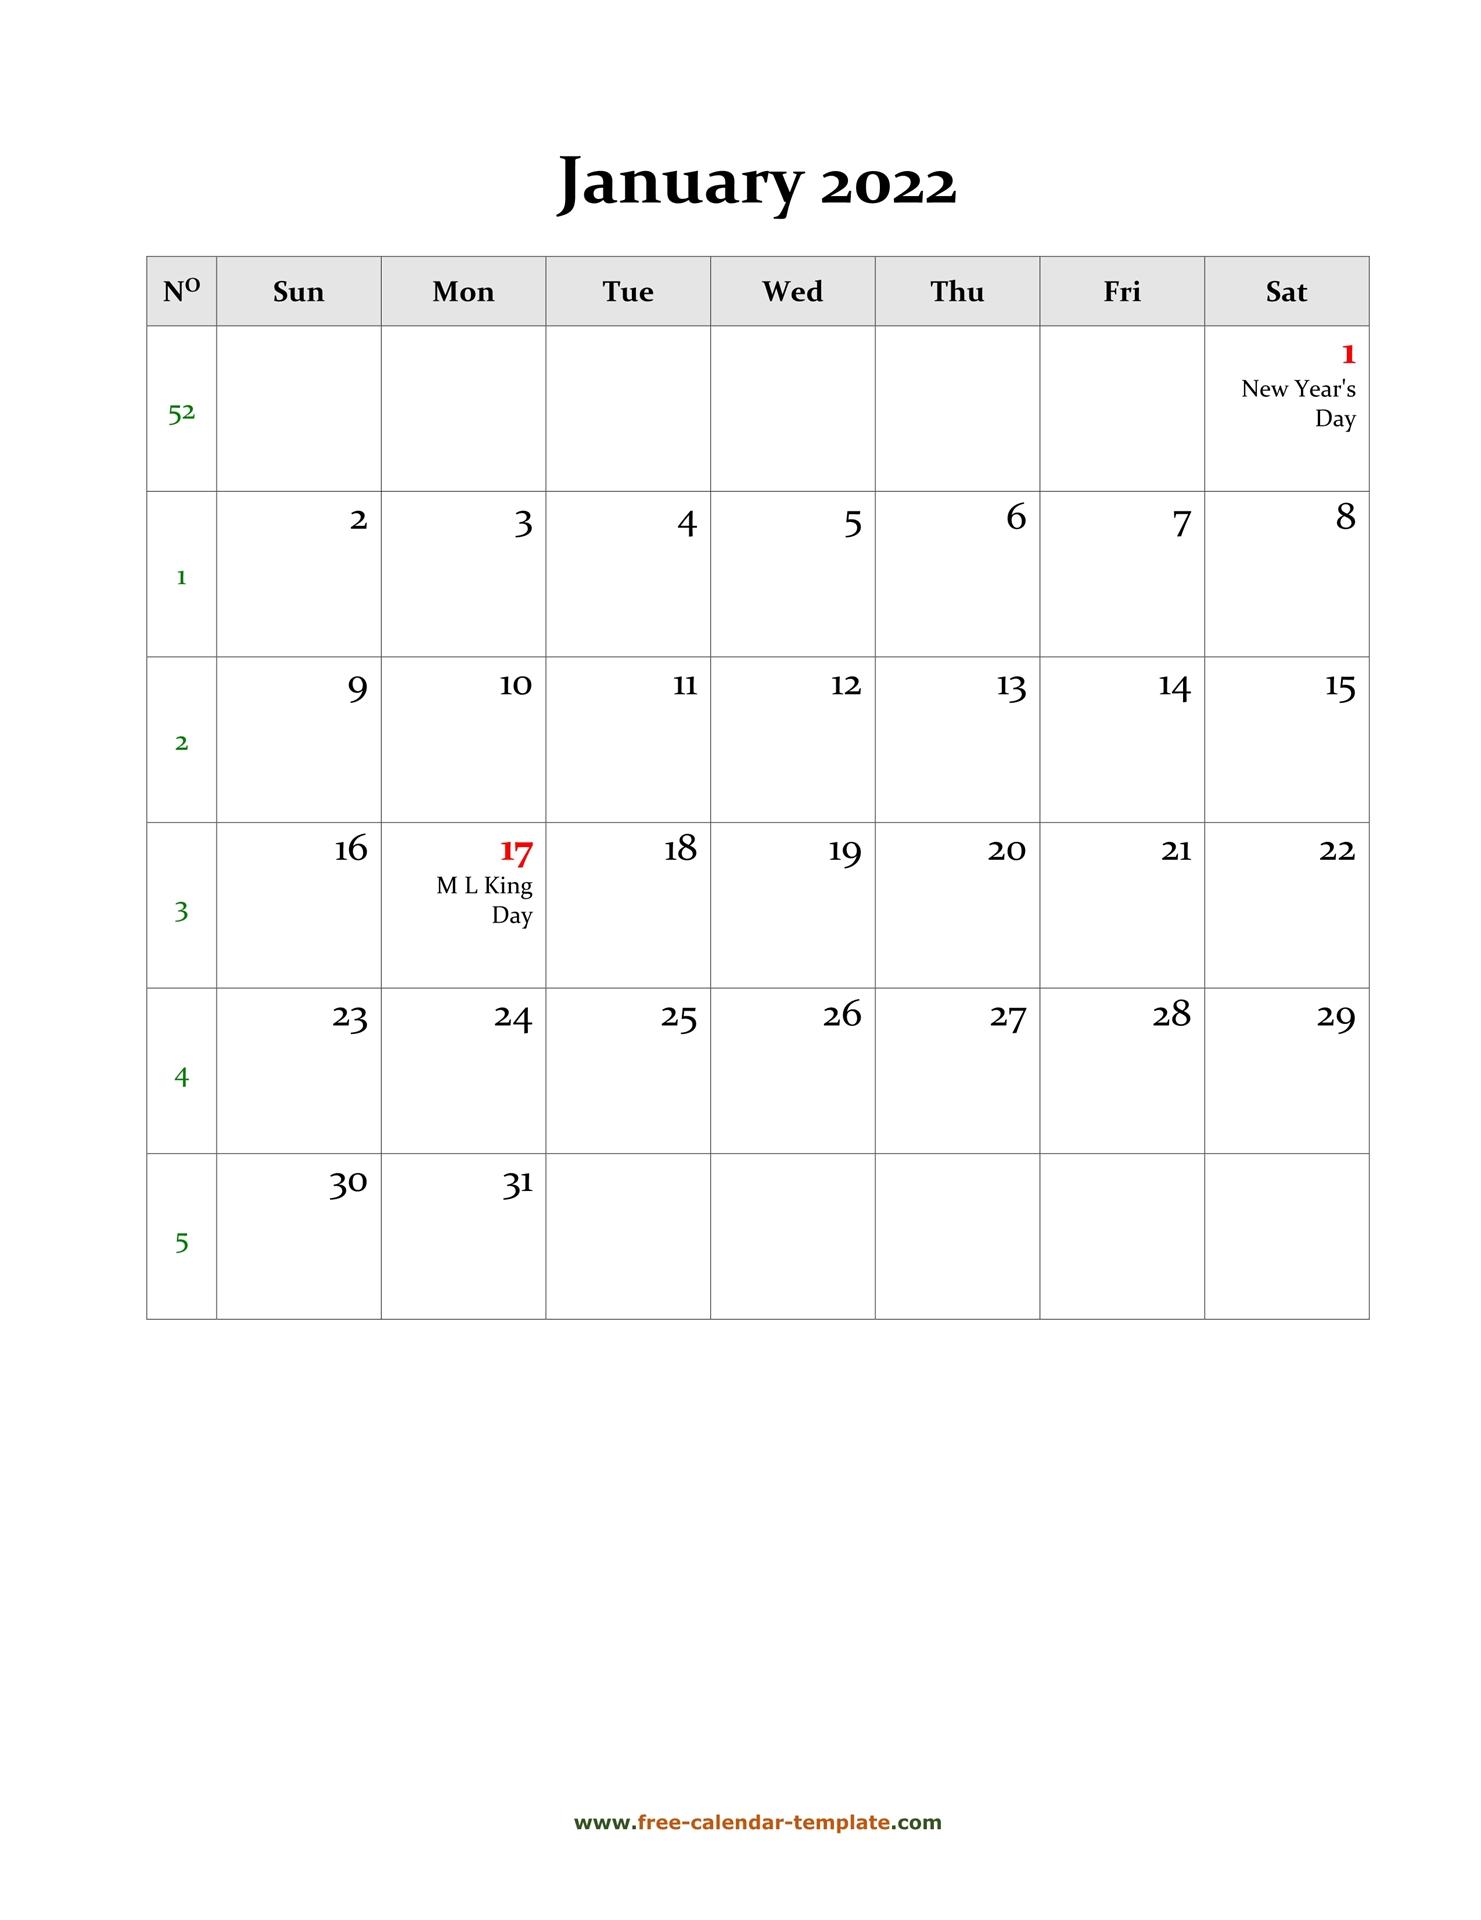 2022 January Calendar (Blank Vertical Template) | Free With Regard To Empty Calendar January 2022